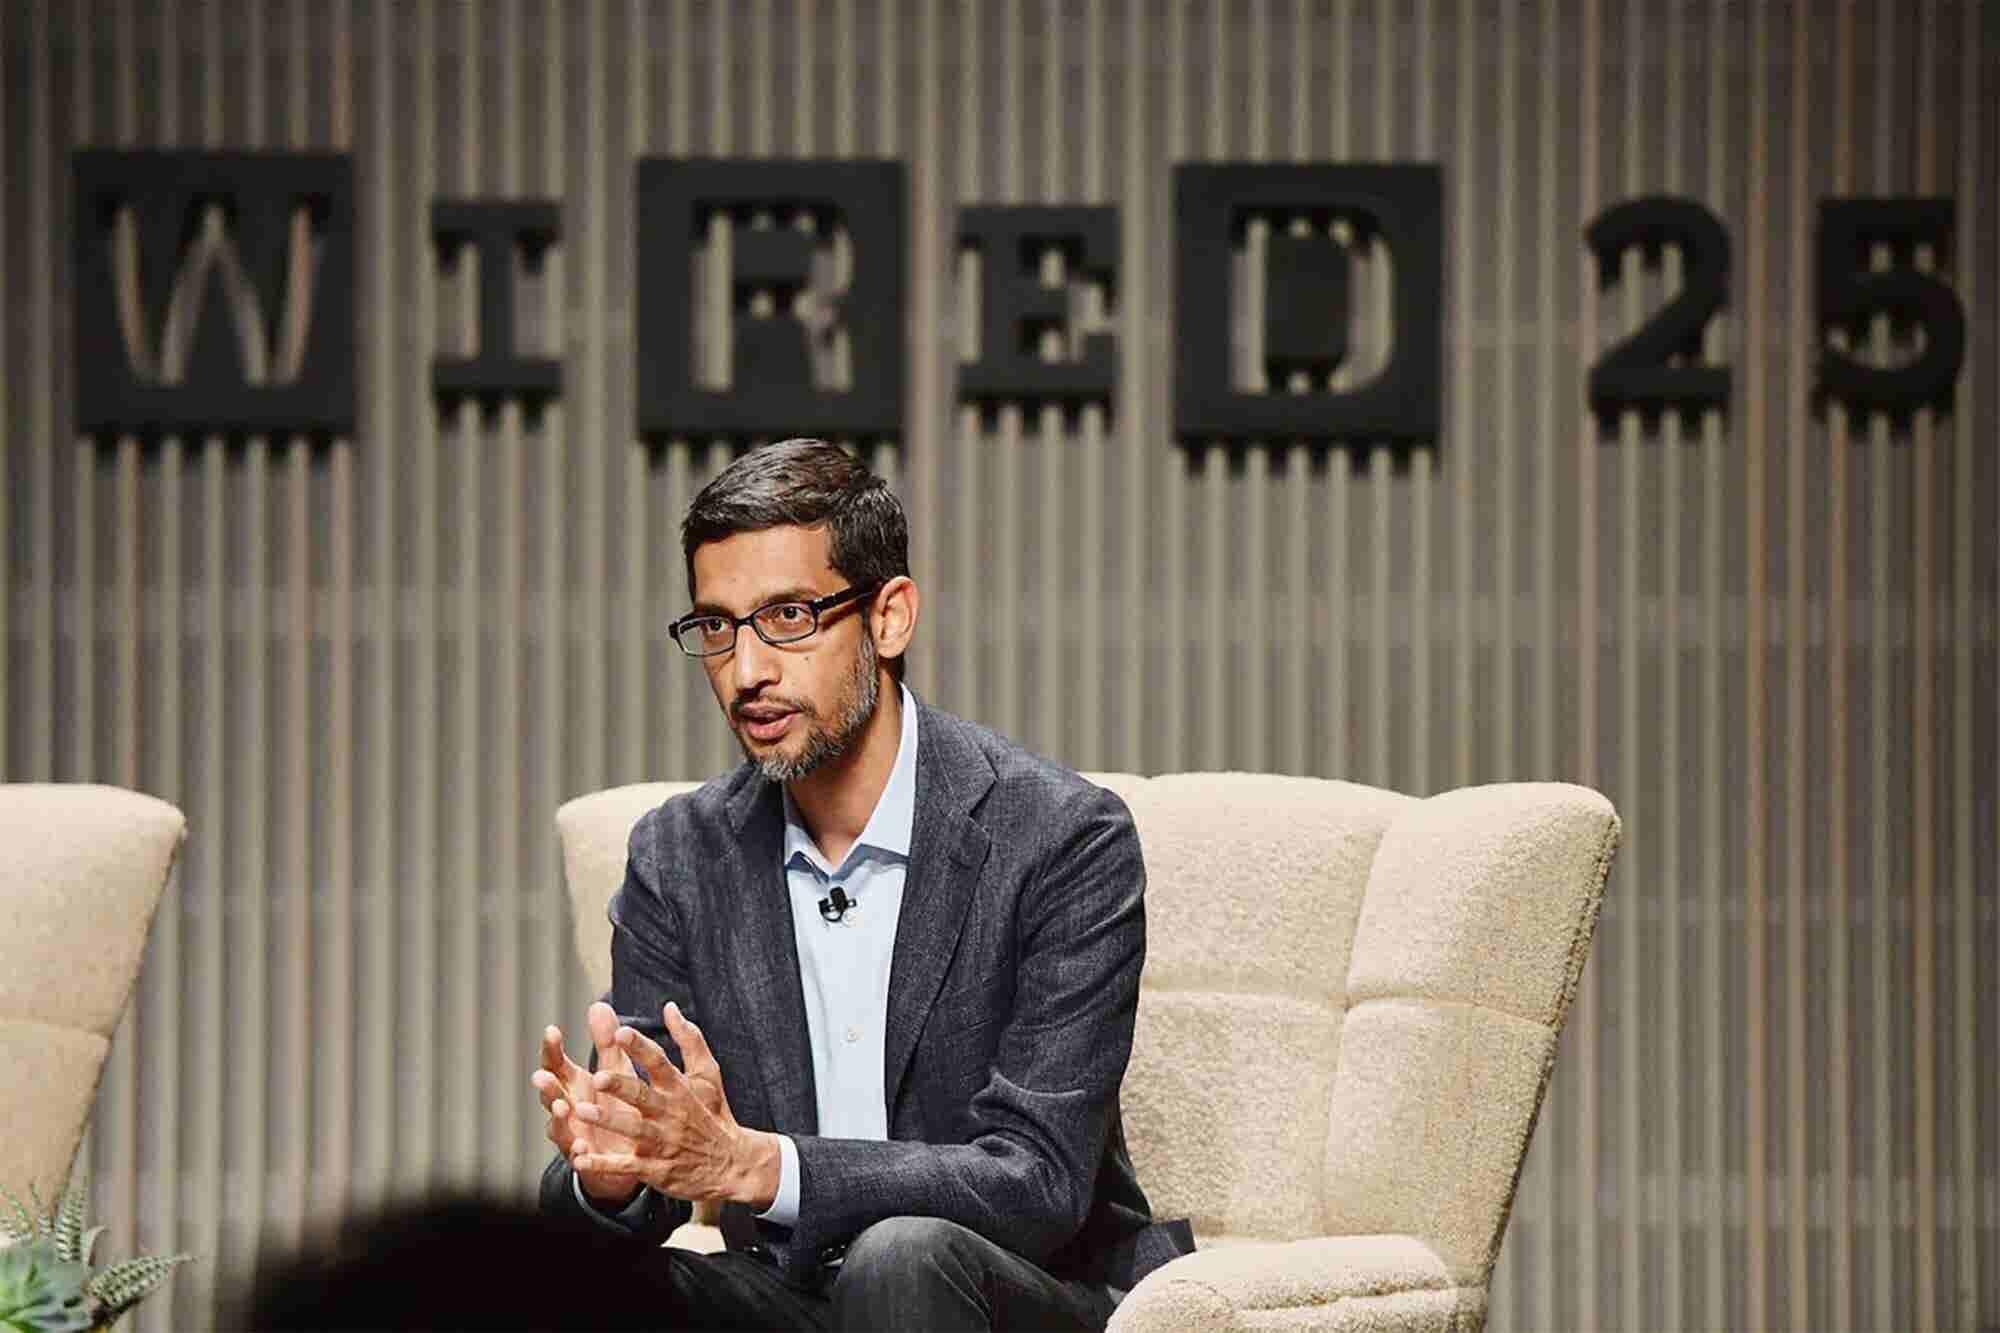 Google CEO Sundar Pichai Confirms Censored China Search Engine